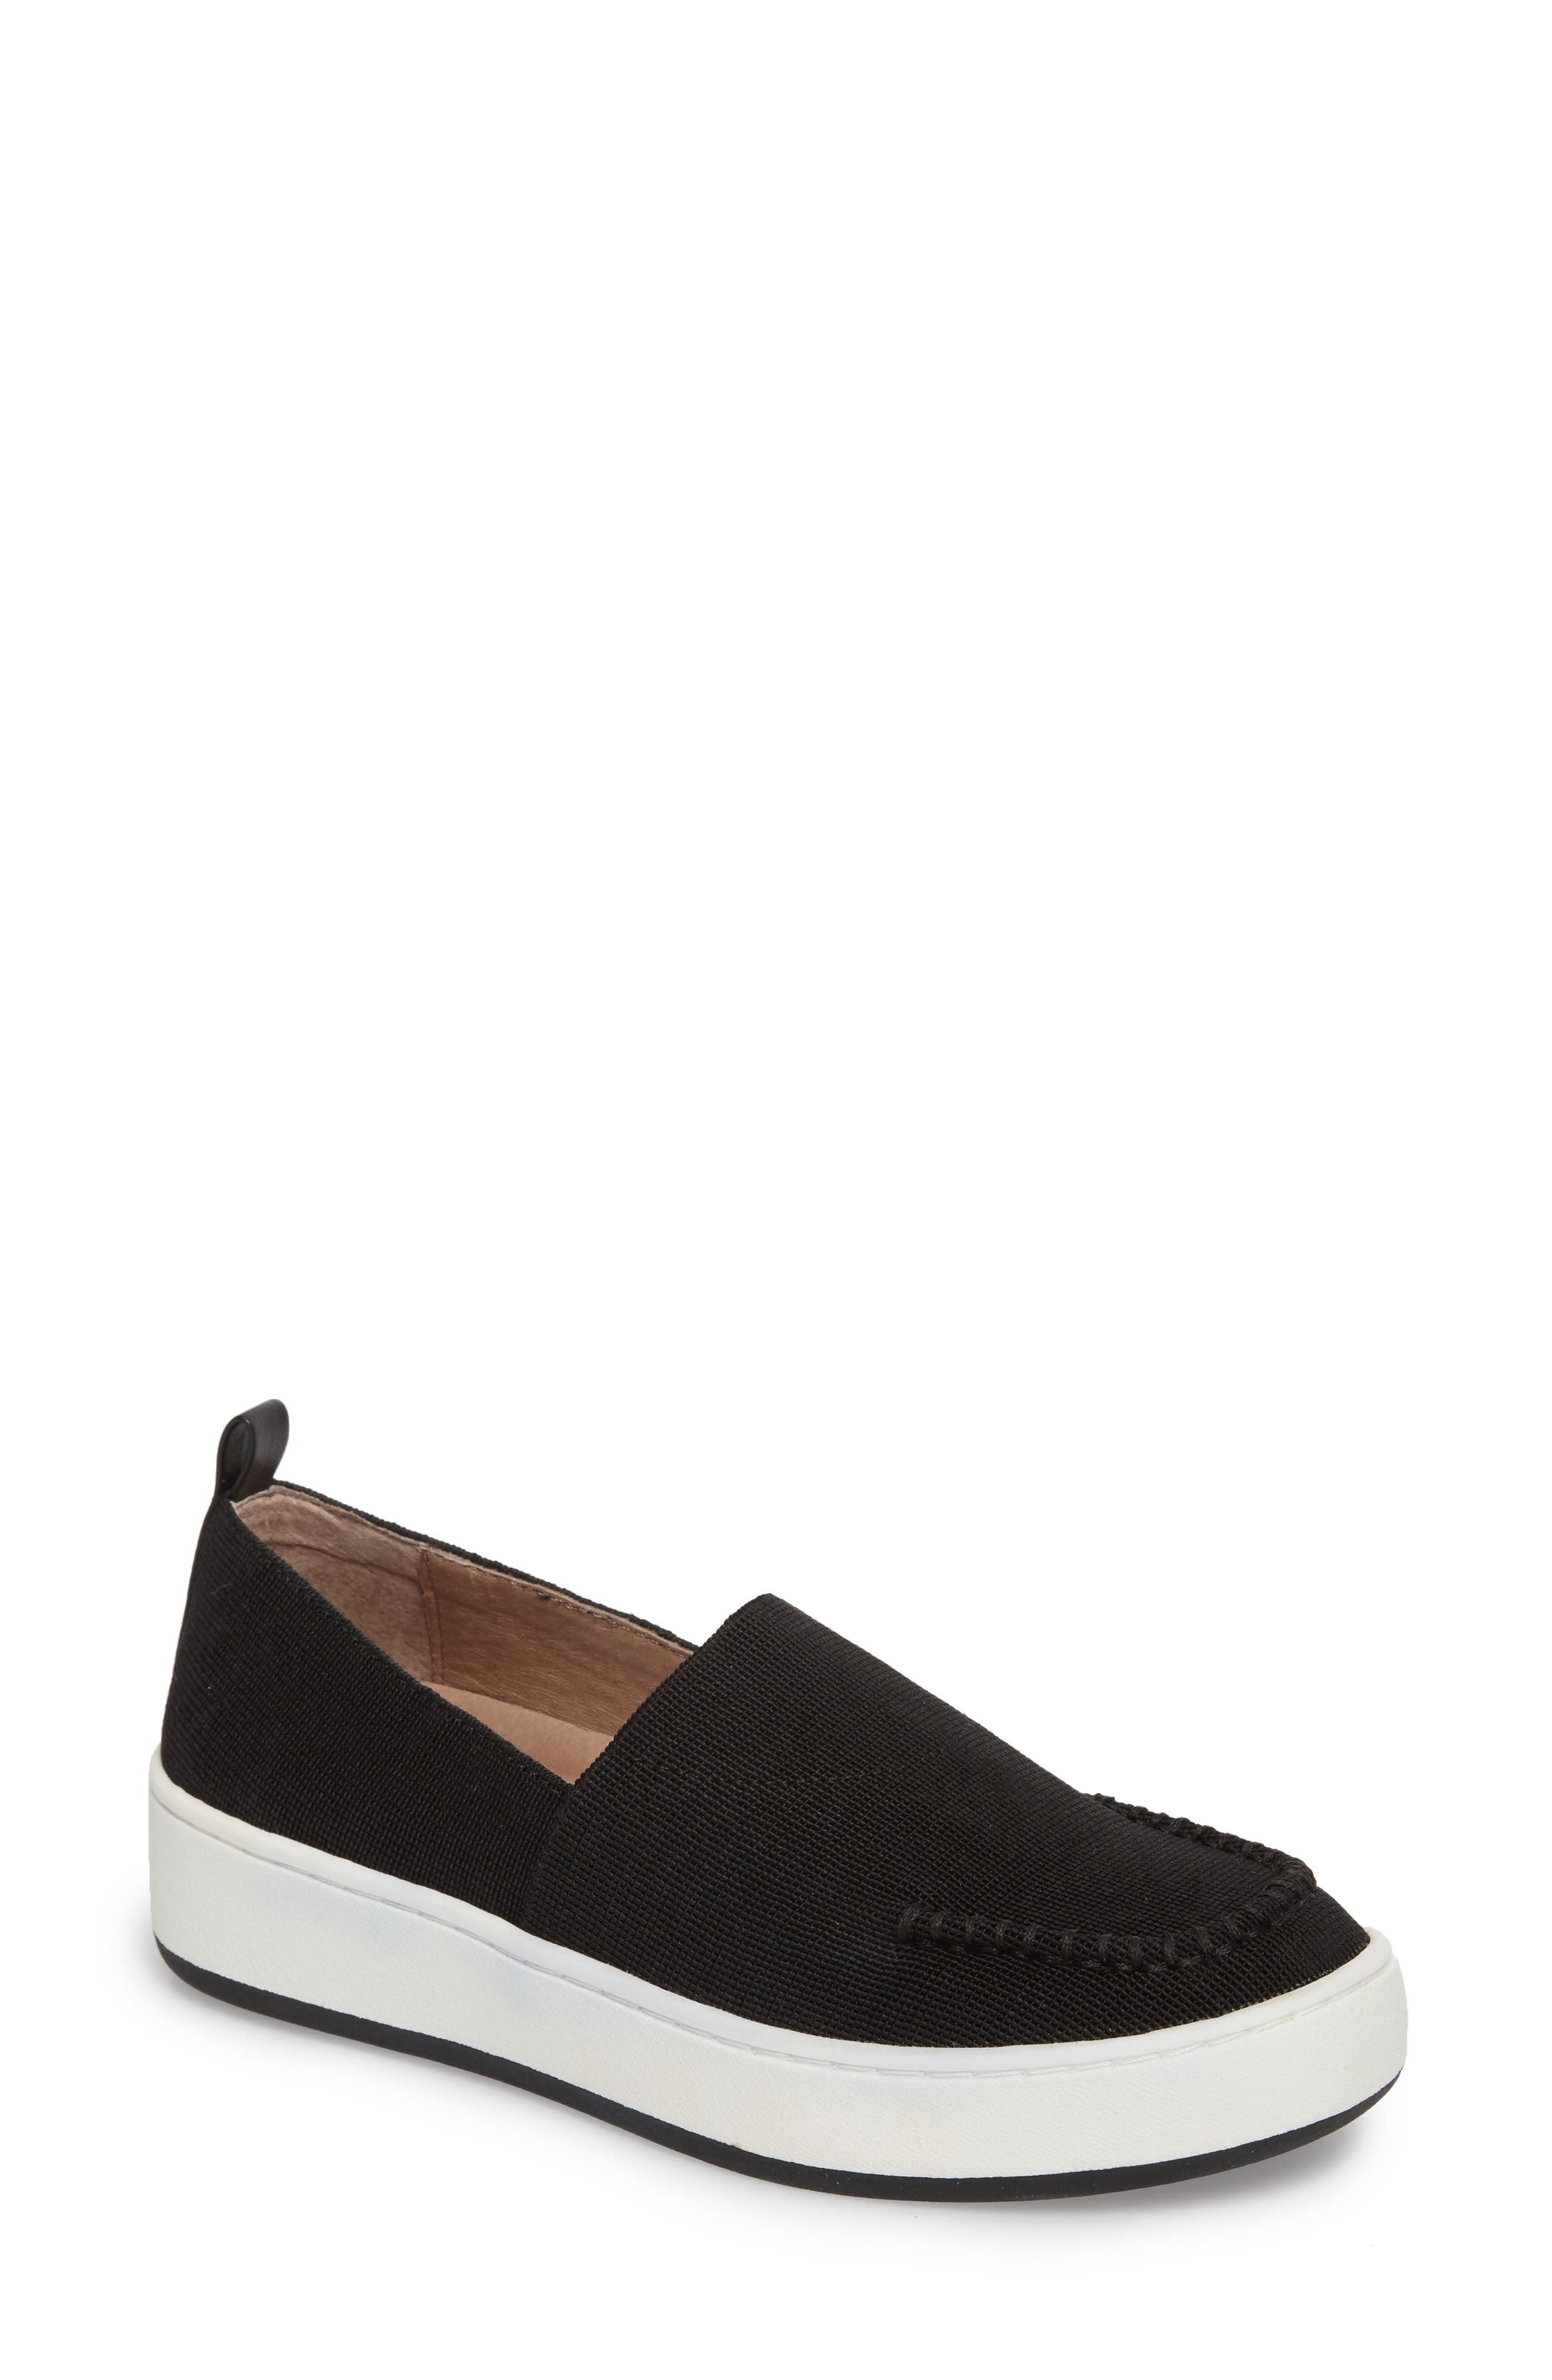 Cory Slip-On Sneaker,                             Main thumbnail 1, color,                             Black Elastic Fabric